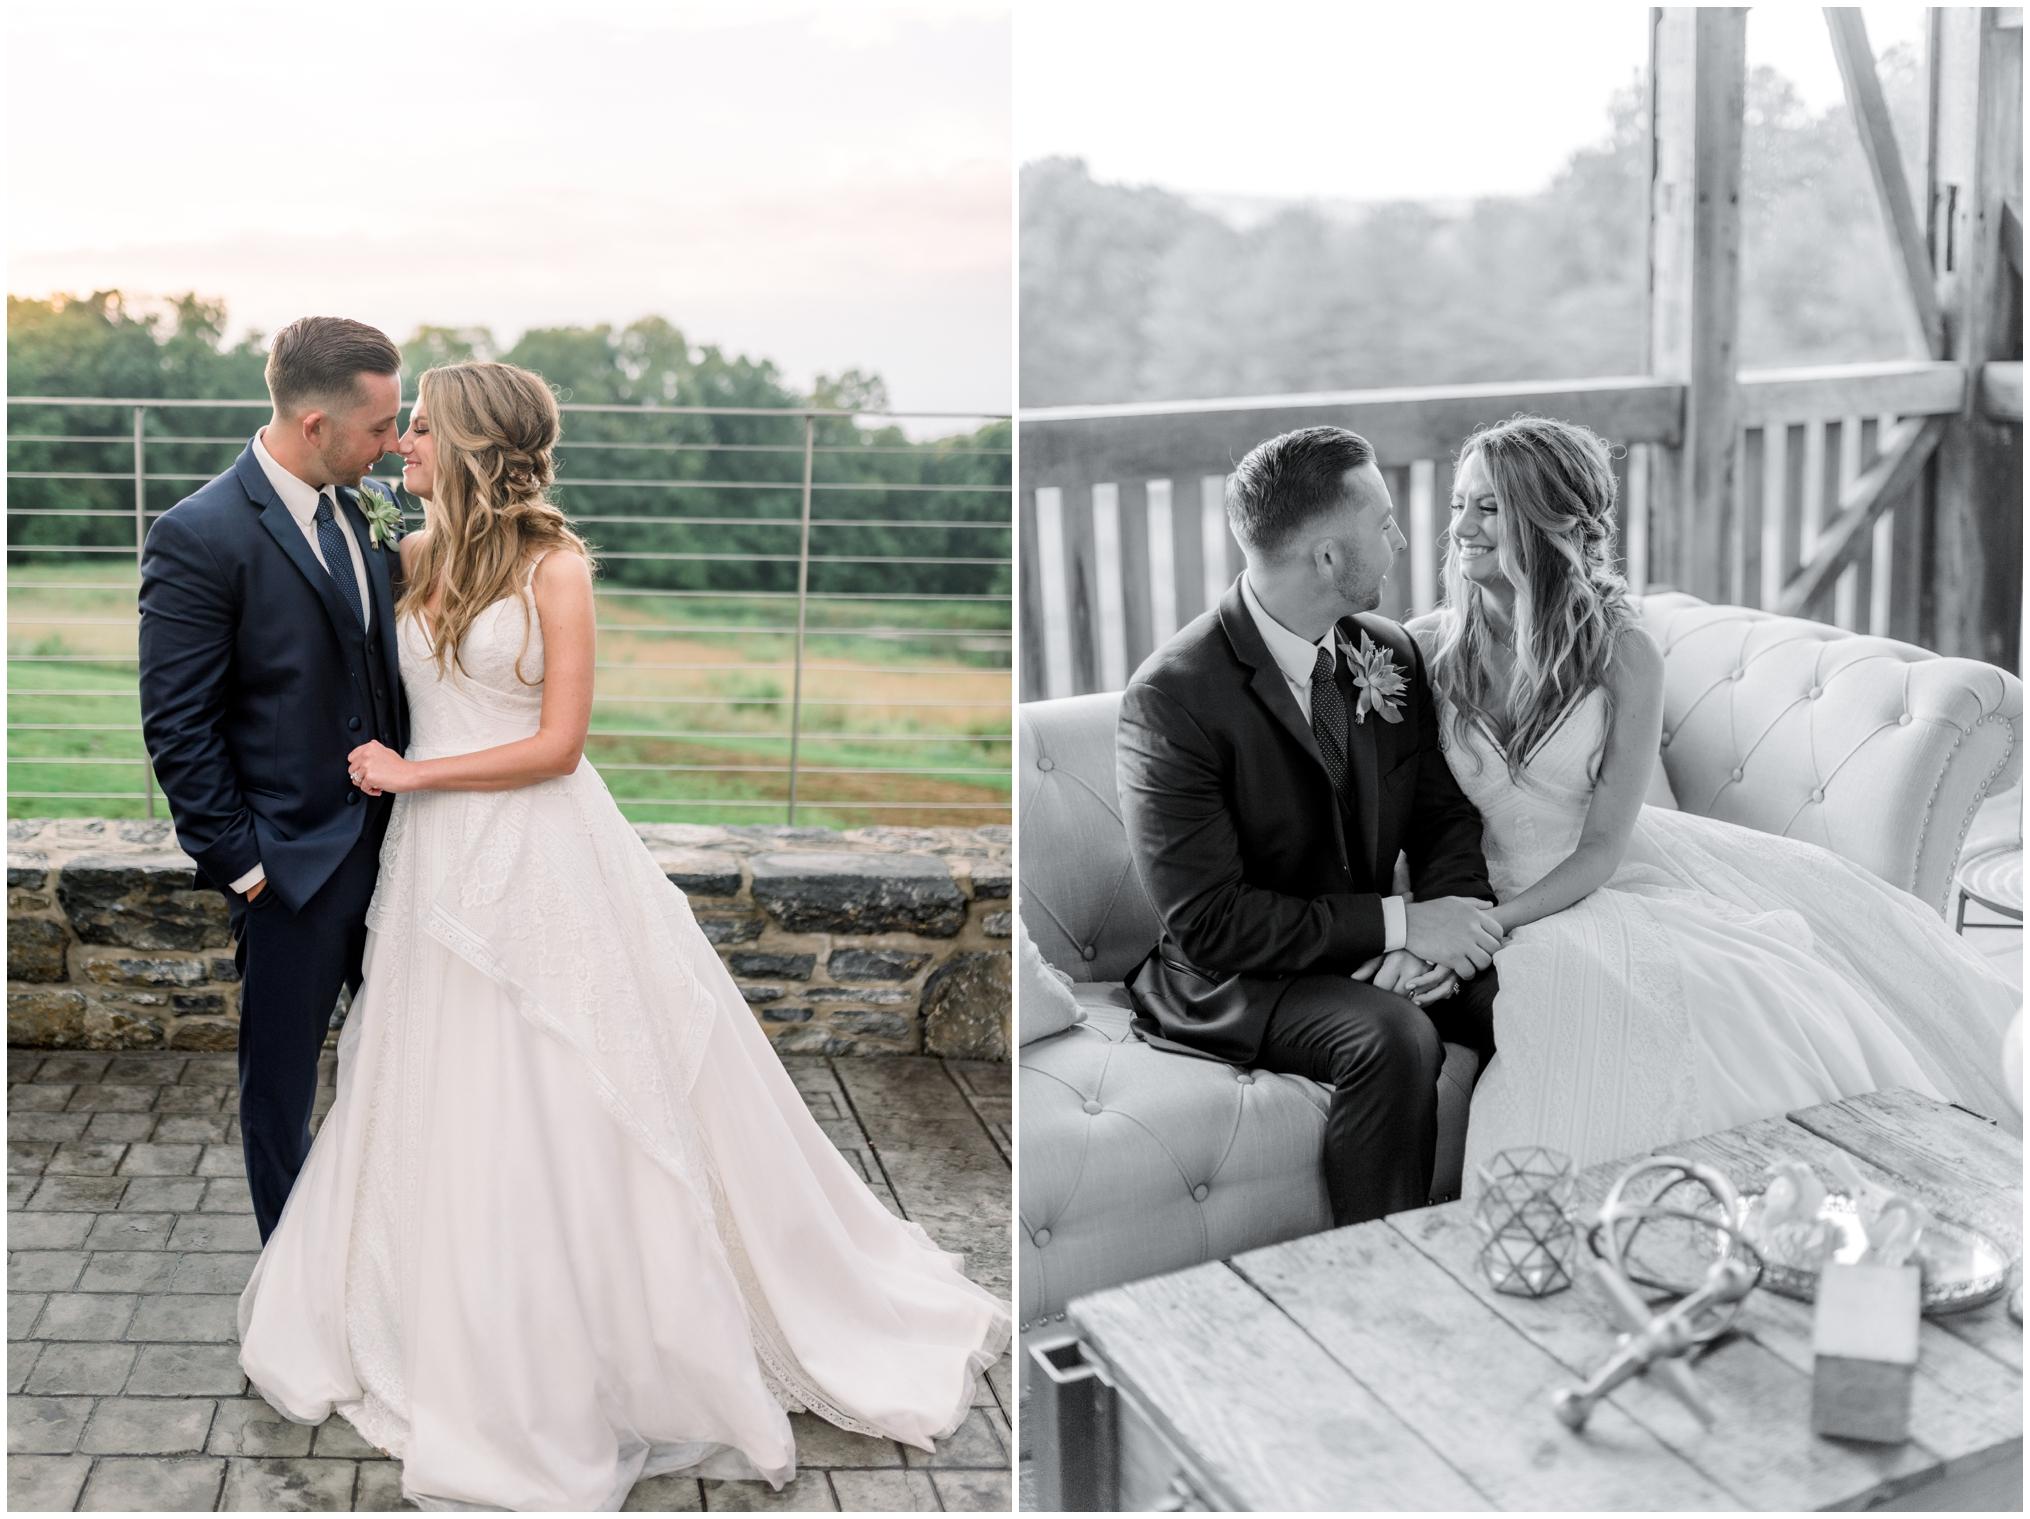 Krista Brackin Photography | July Wedding at The Farm at Eagle's Ridge_0022.jpg